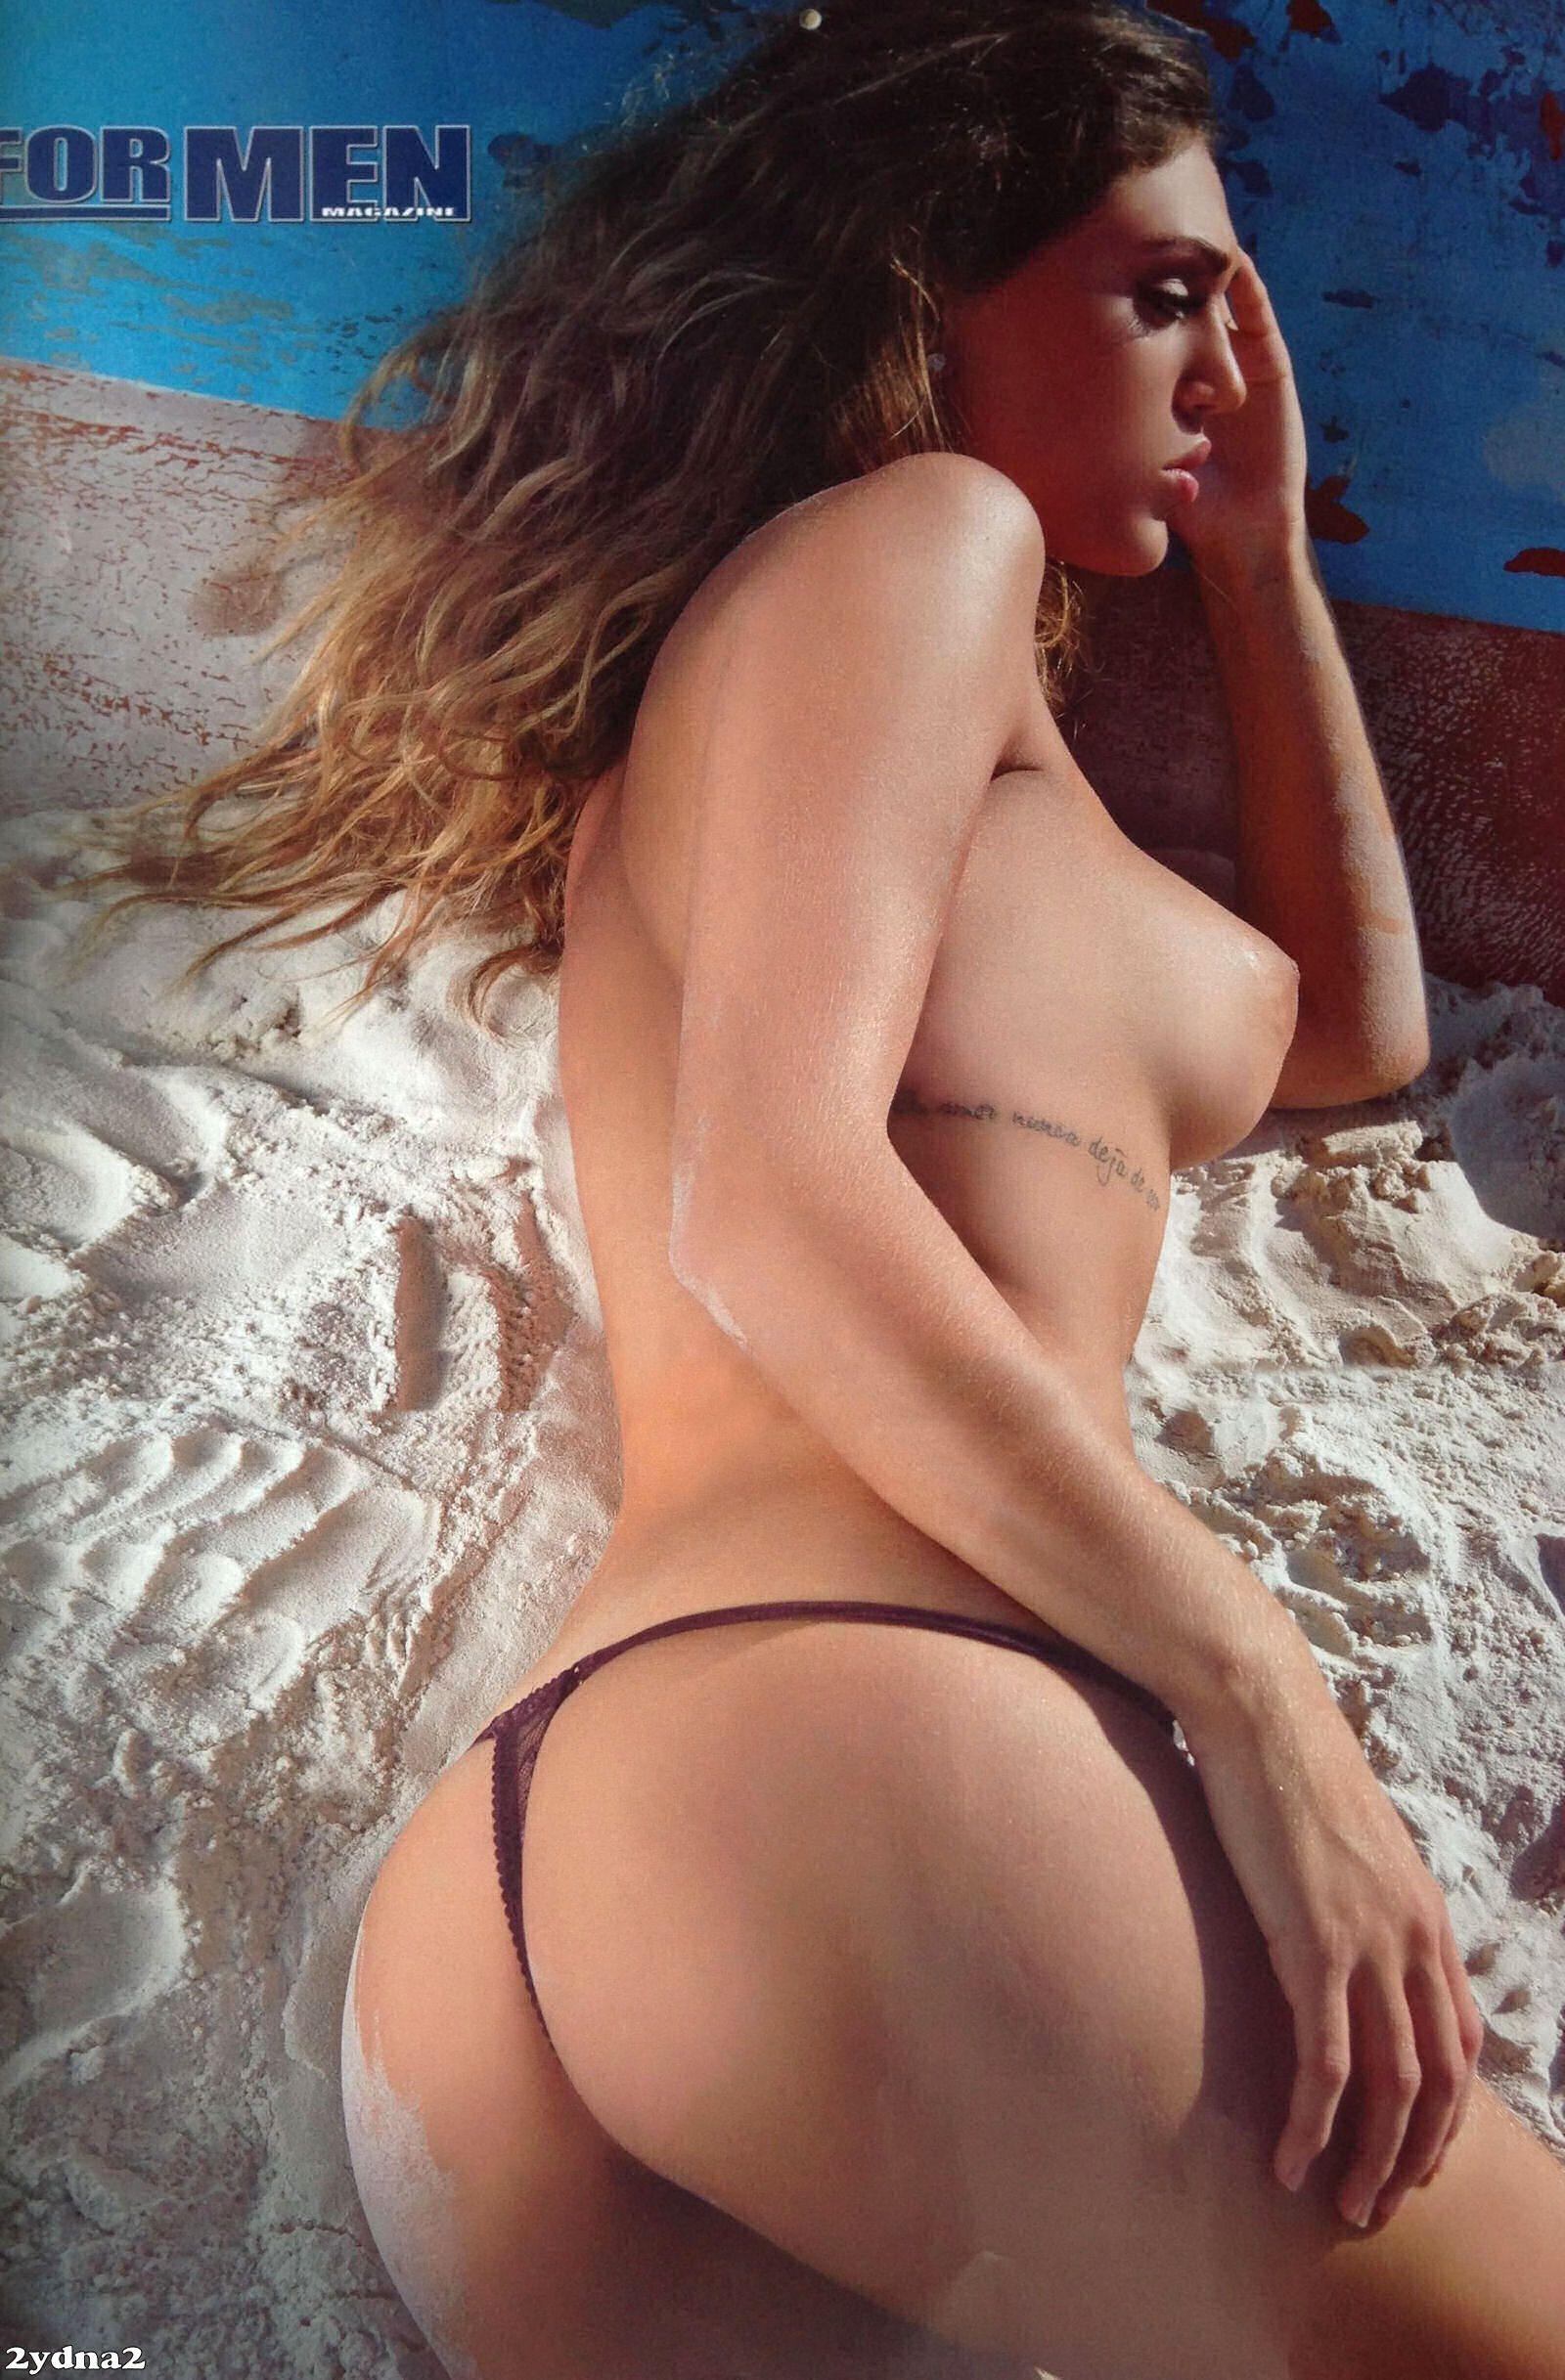 letizia bruni paris hilton porno